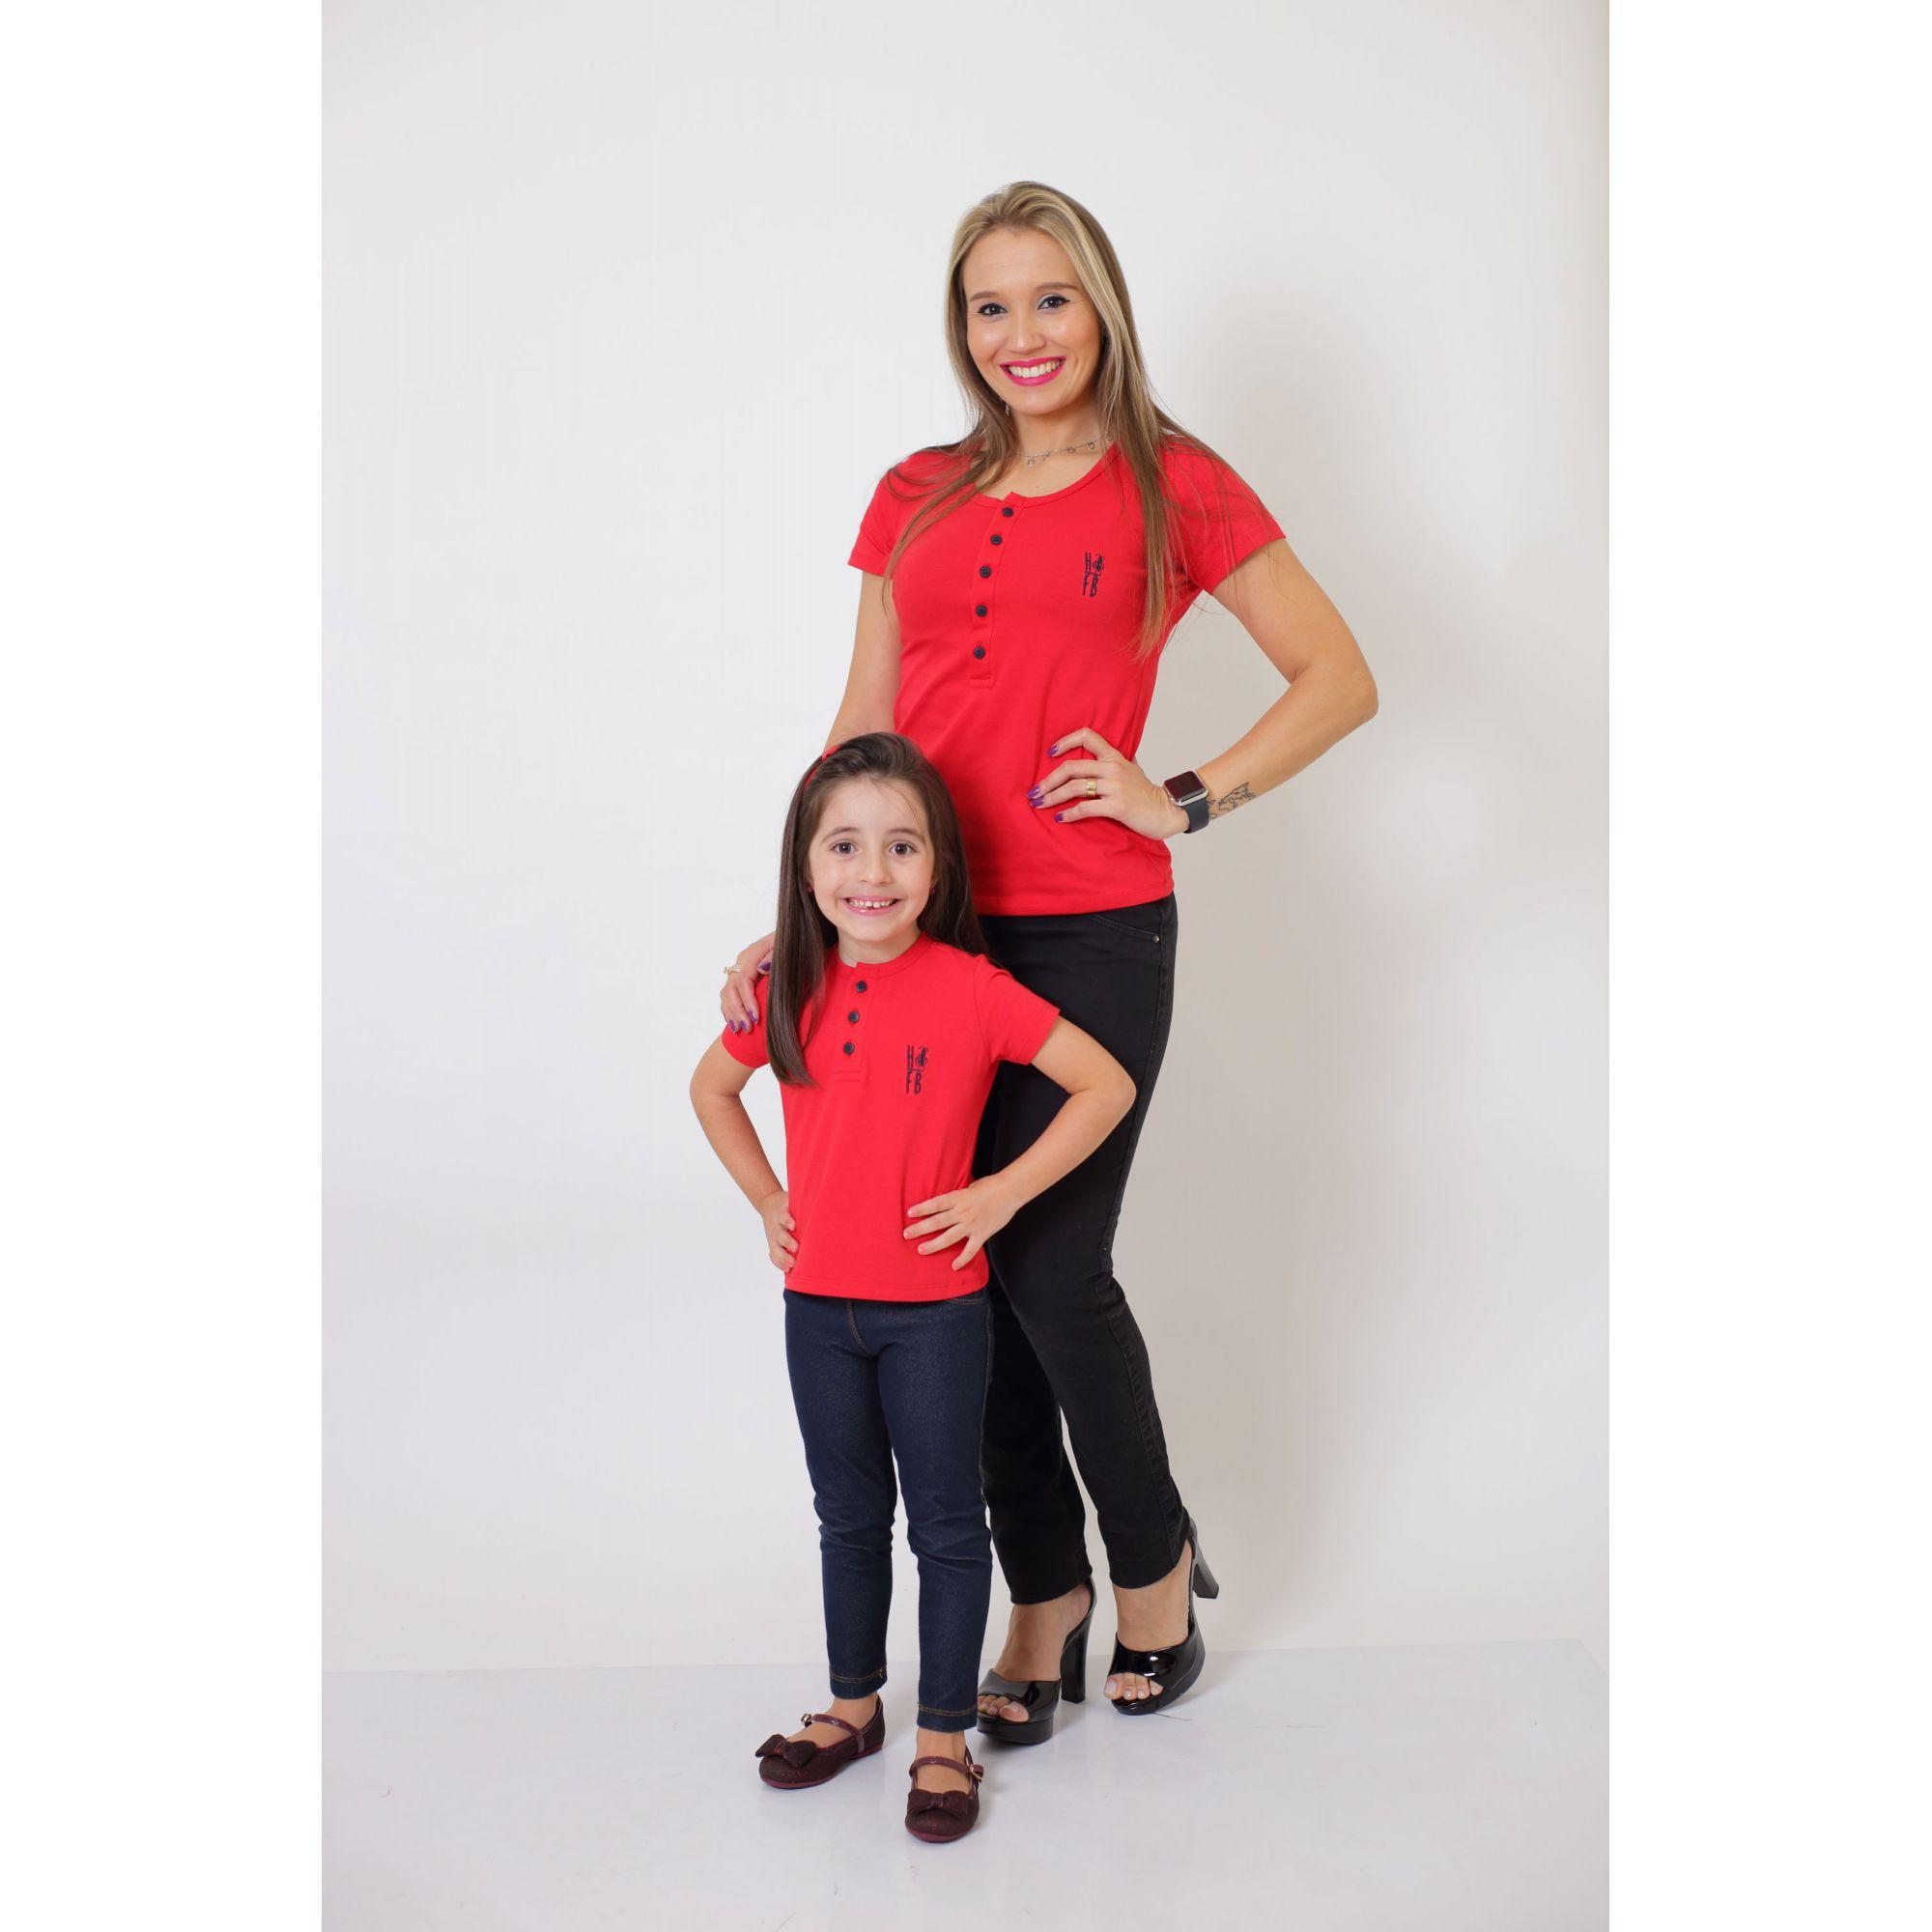 MÃE E FILHO > Kit 02 Peças - T-Shirts ou Body Henley - Vermelho [Coleção Tal Mãe Tal Filho]  - Heitor Fashion Brazil